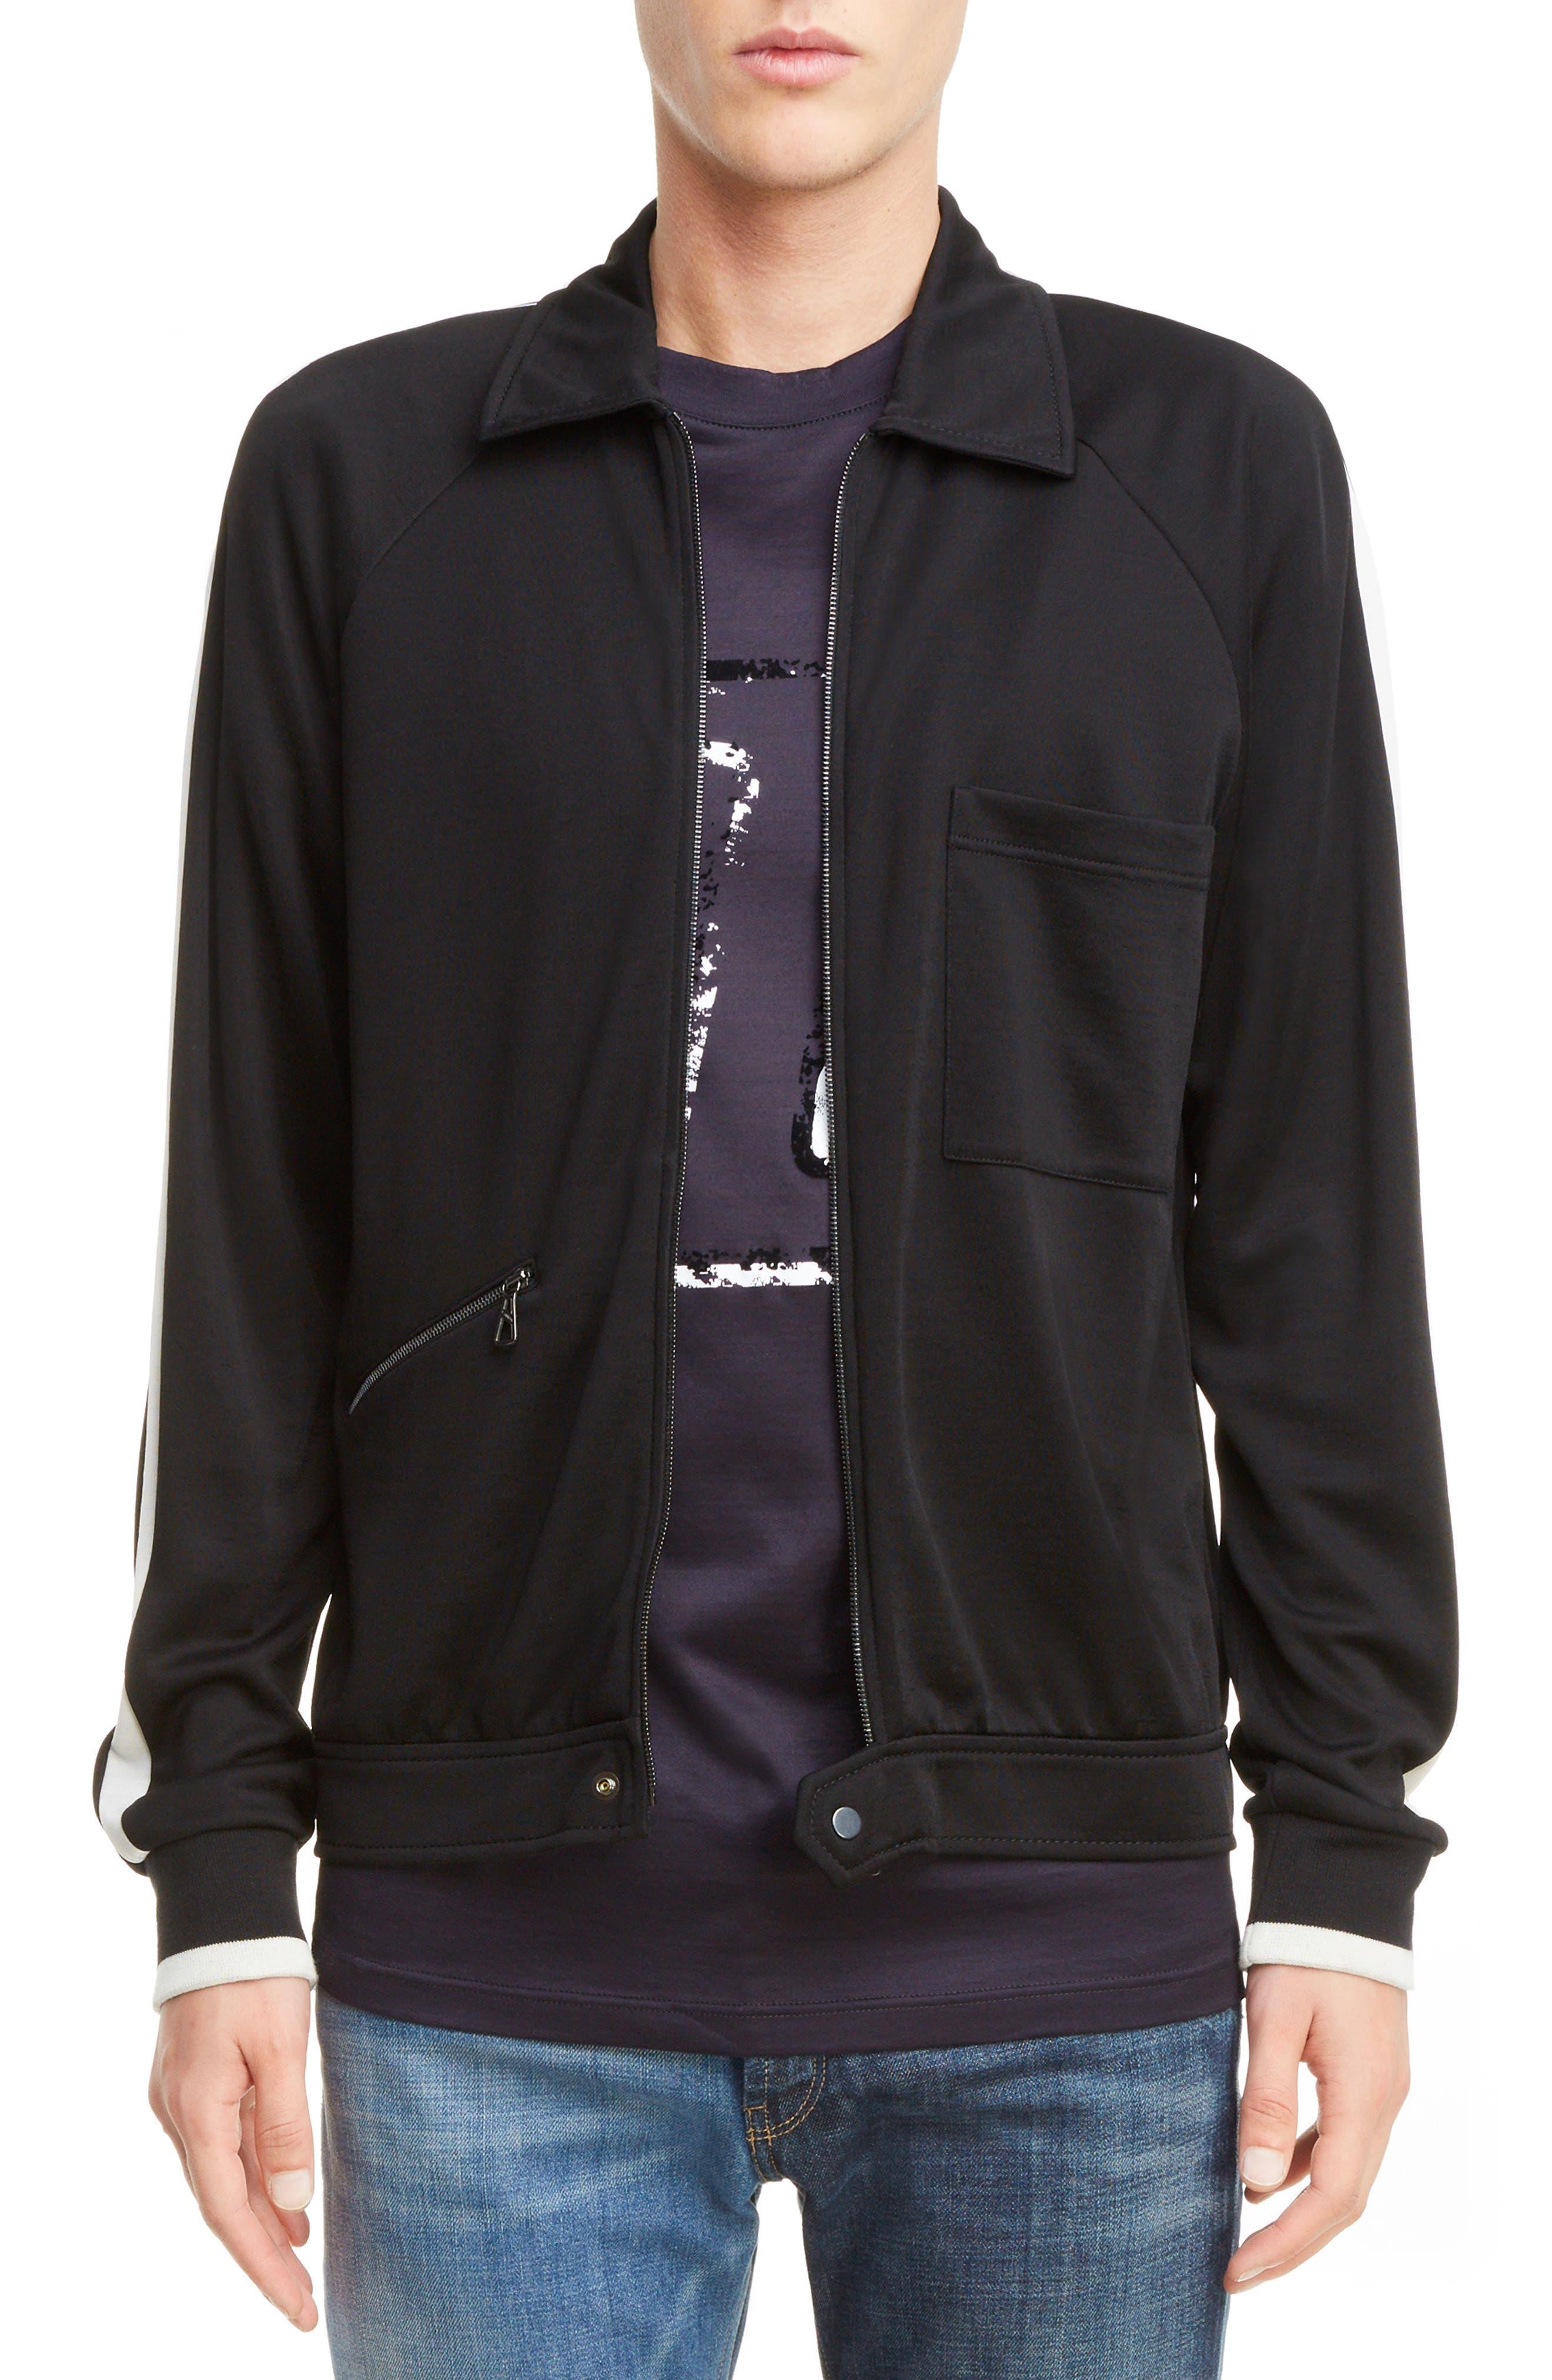 LANVIN Track Jacket